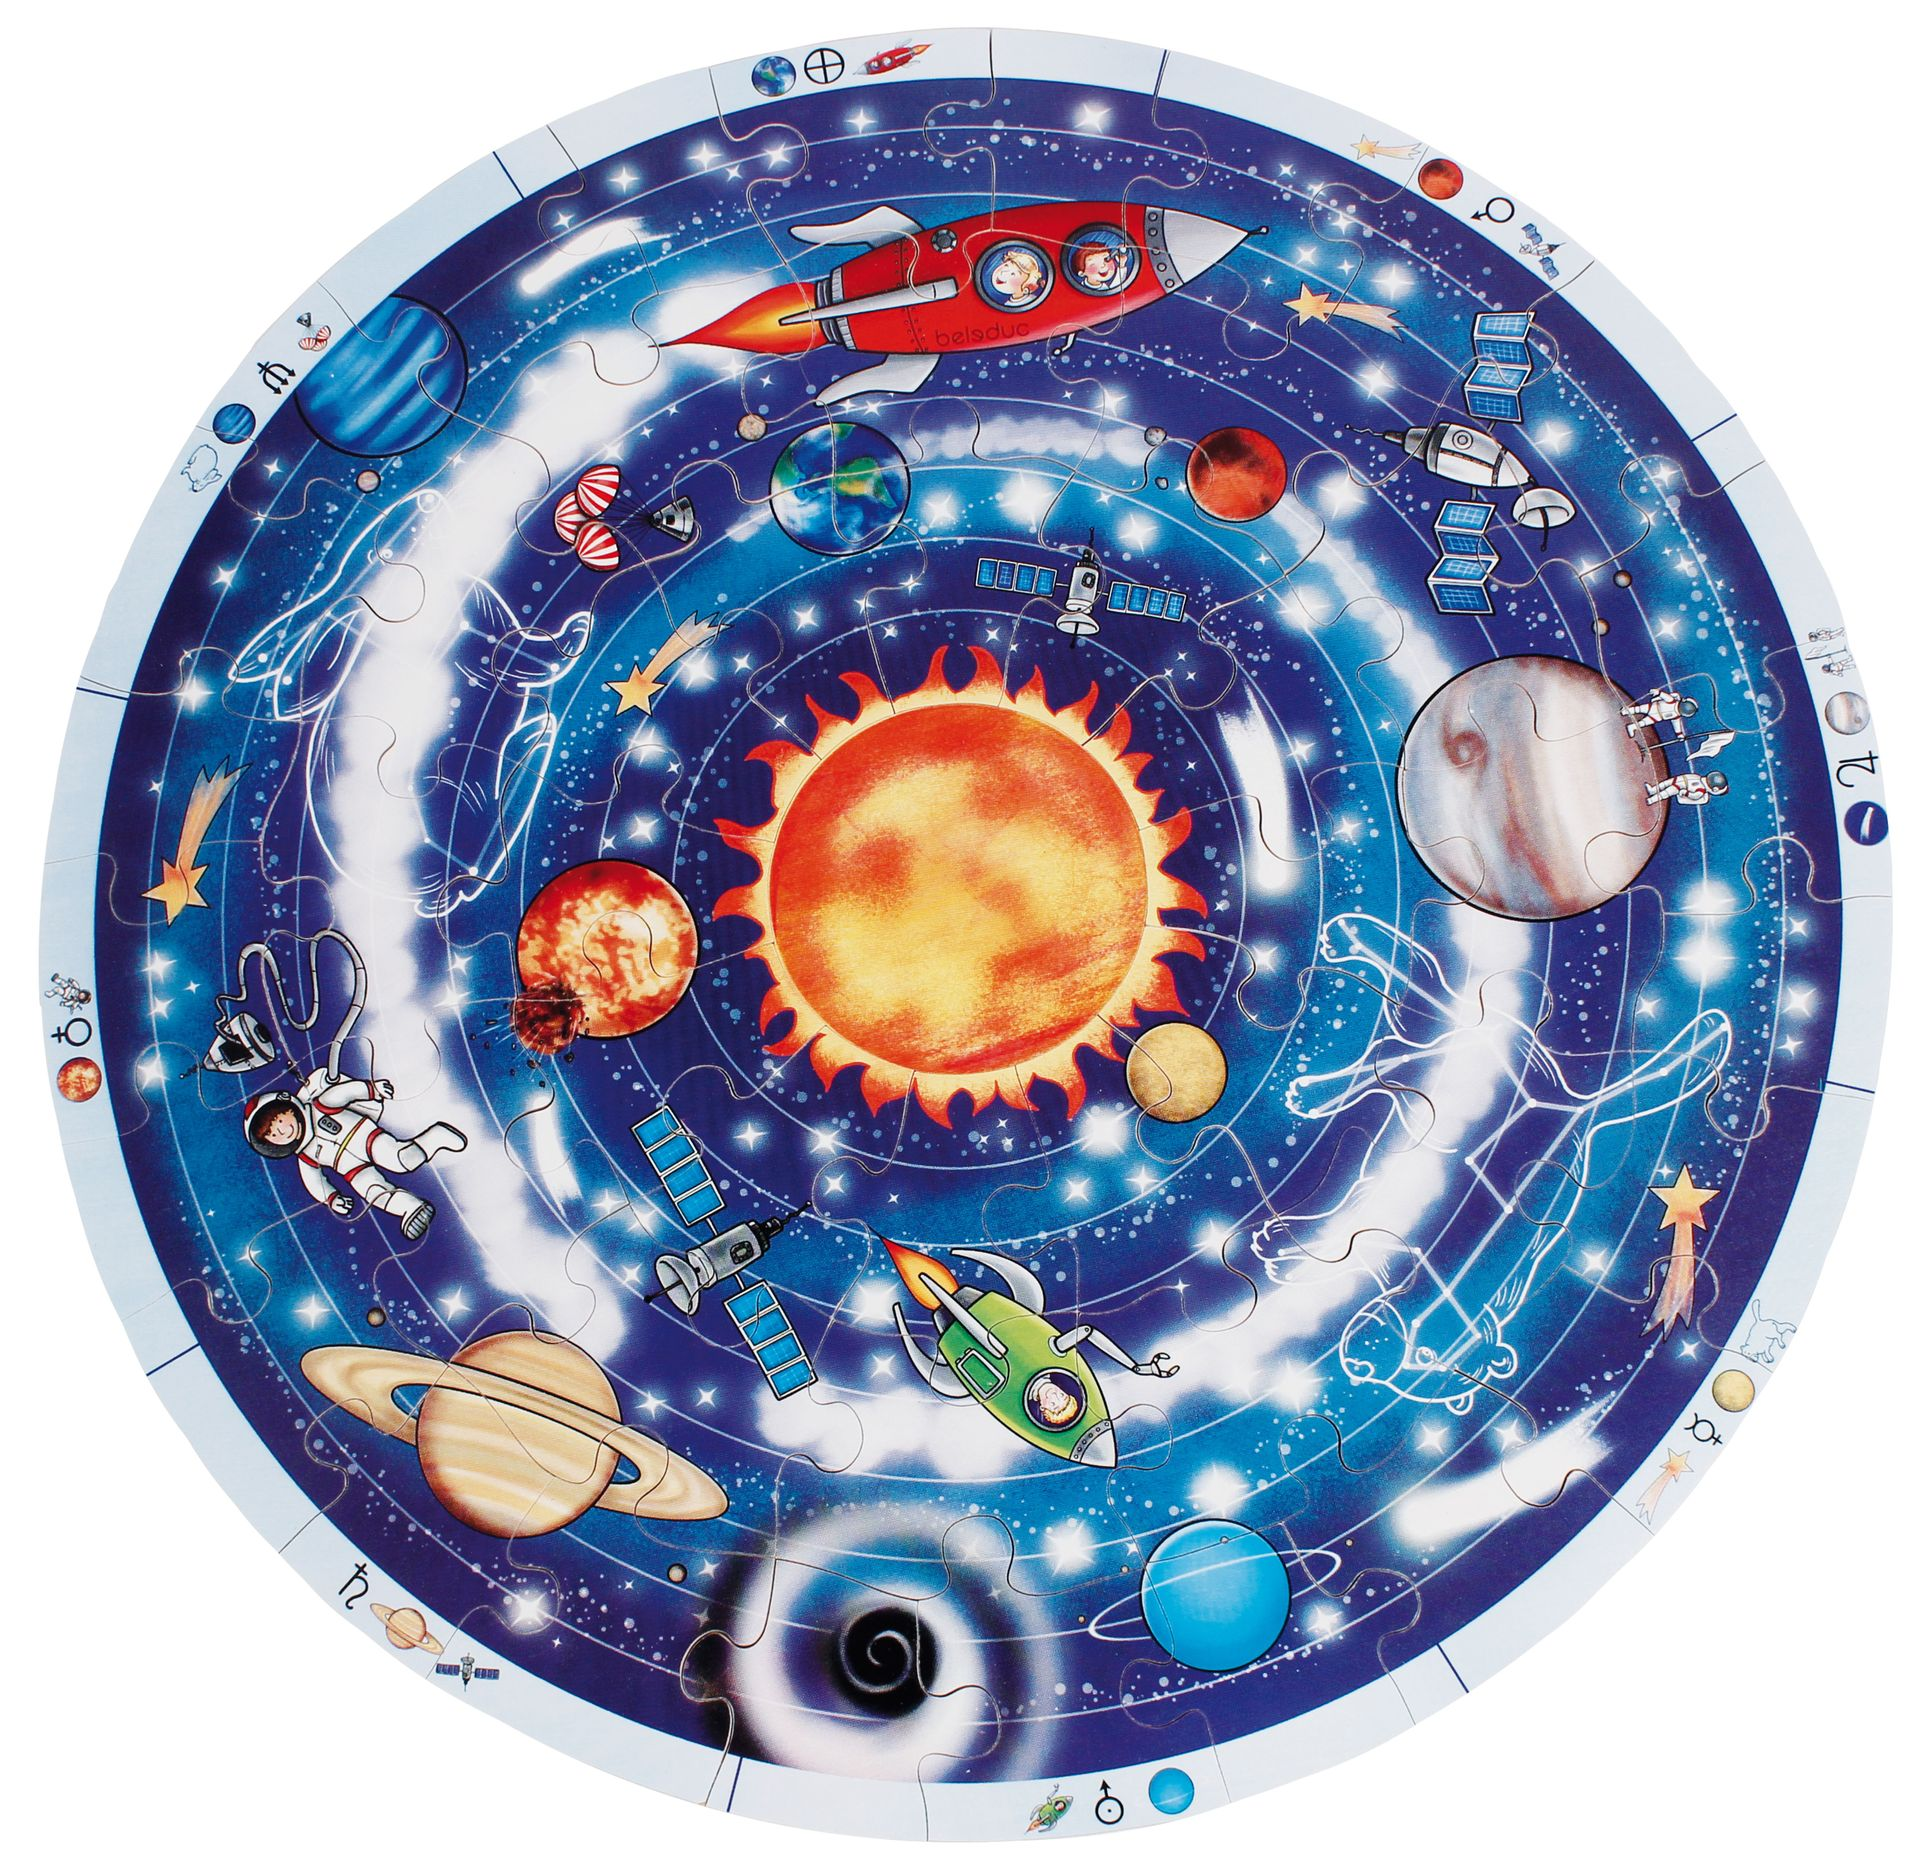 XXL Lernpuzzle Planeten